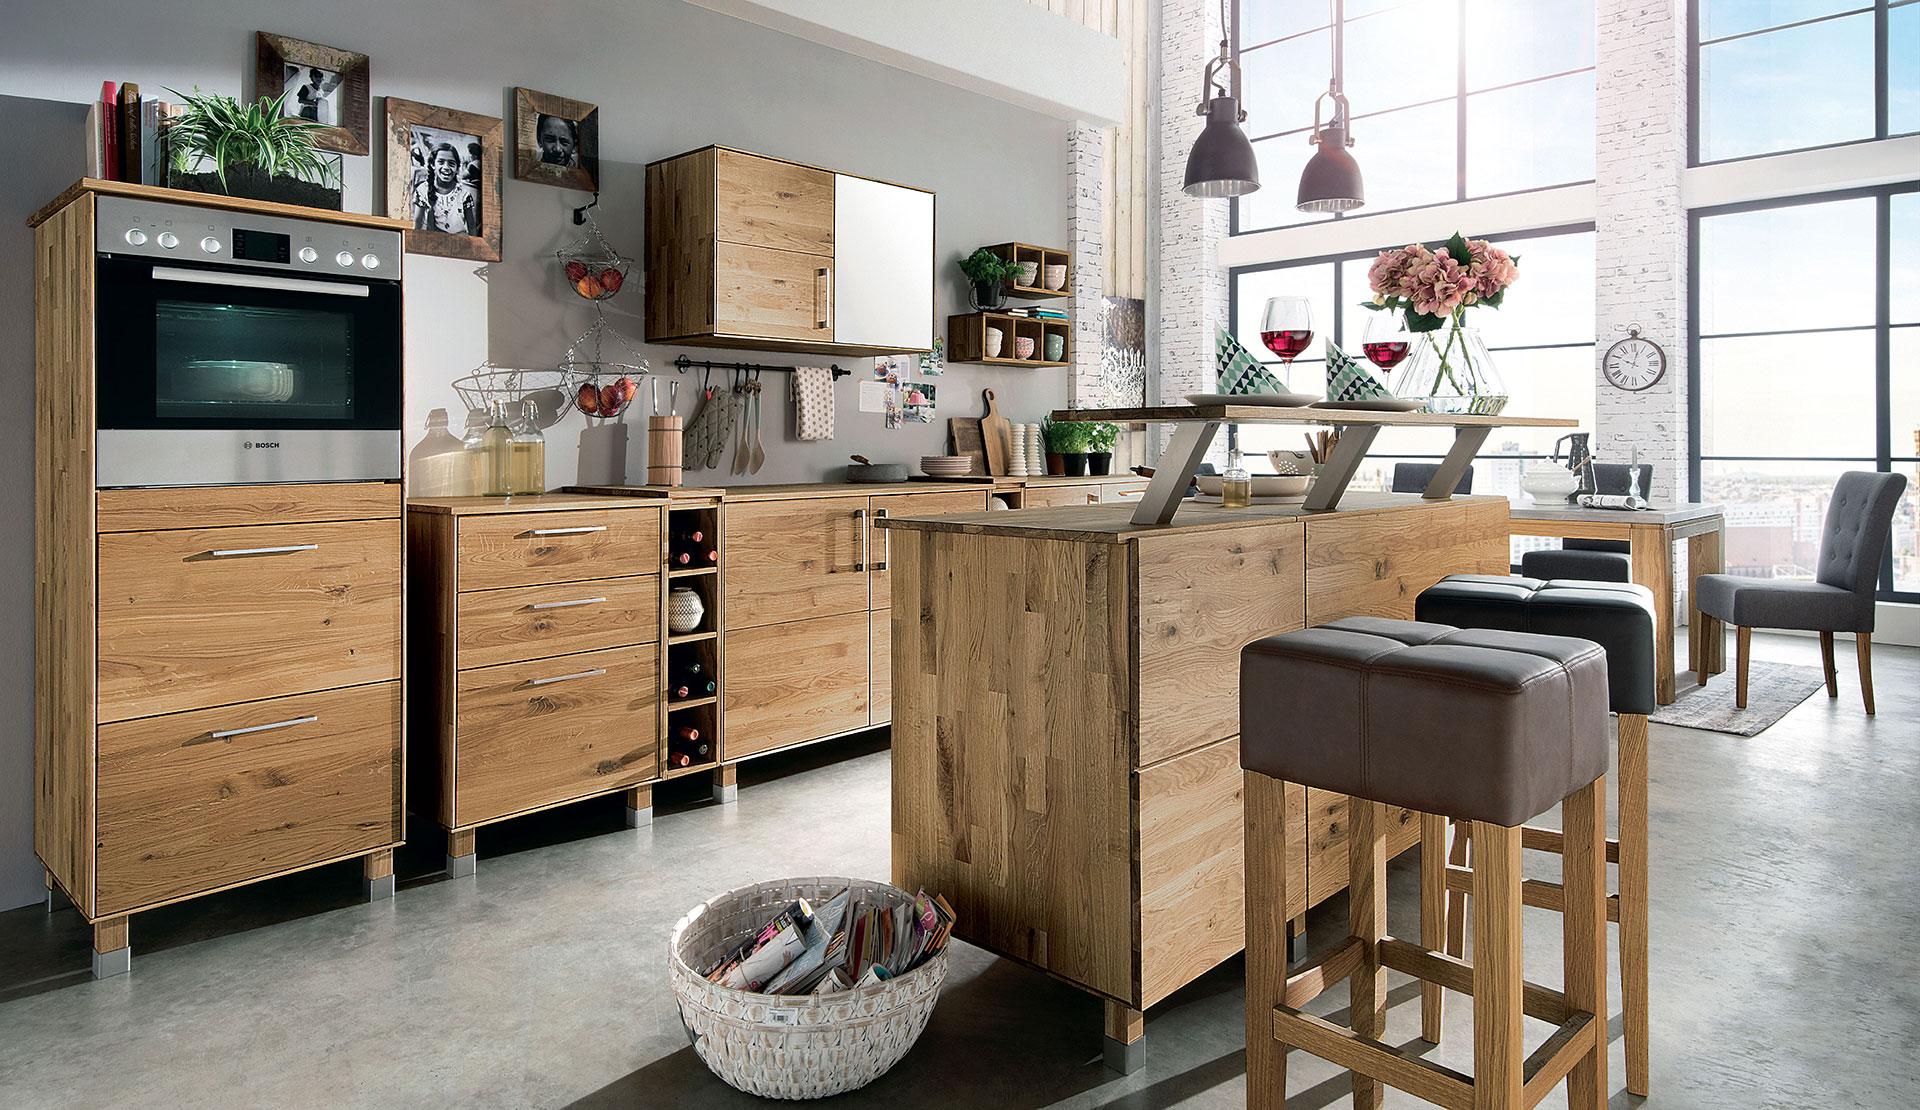 Full Size of Modulküche Edelstahl Massivholz Modulkche Culinara Schadstoffgeprft Edelstahlküche Gebraucht Garten Ikea Outdoor Küche Holz Wohnzimmer Modulküche Edelstahl